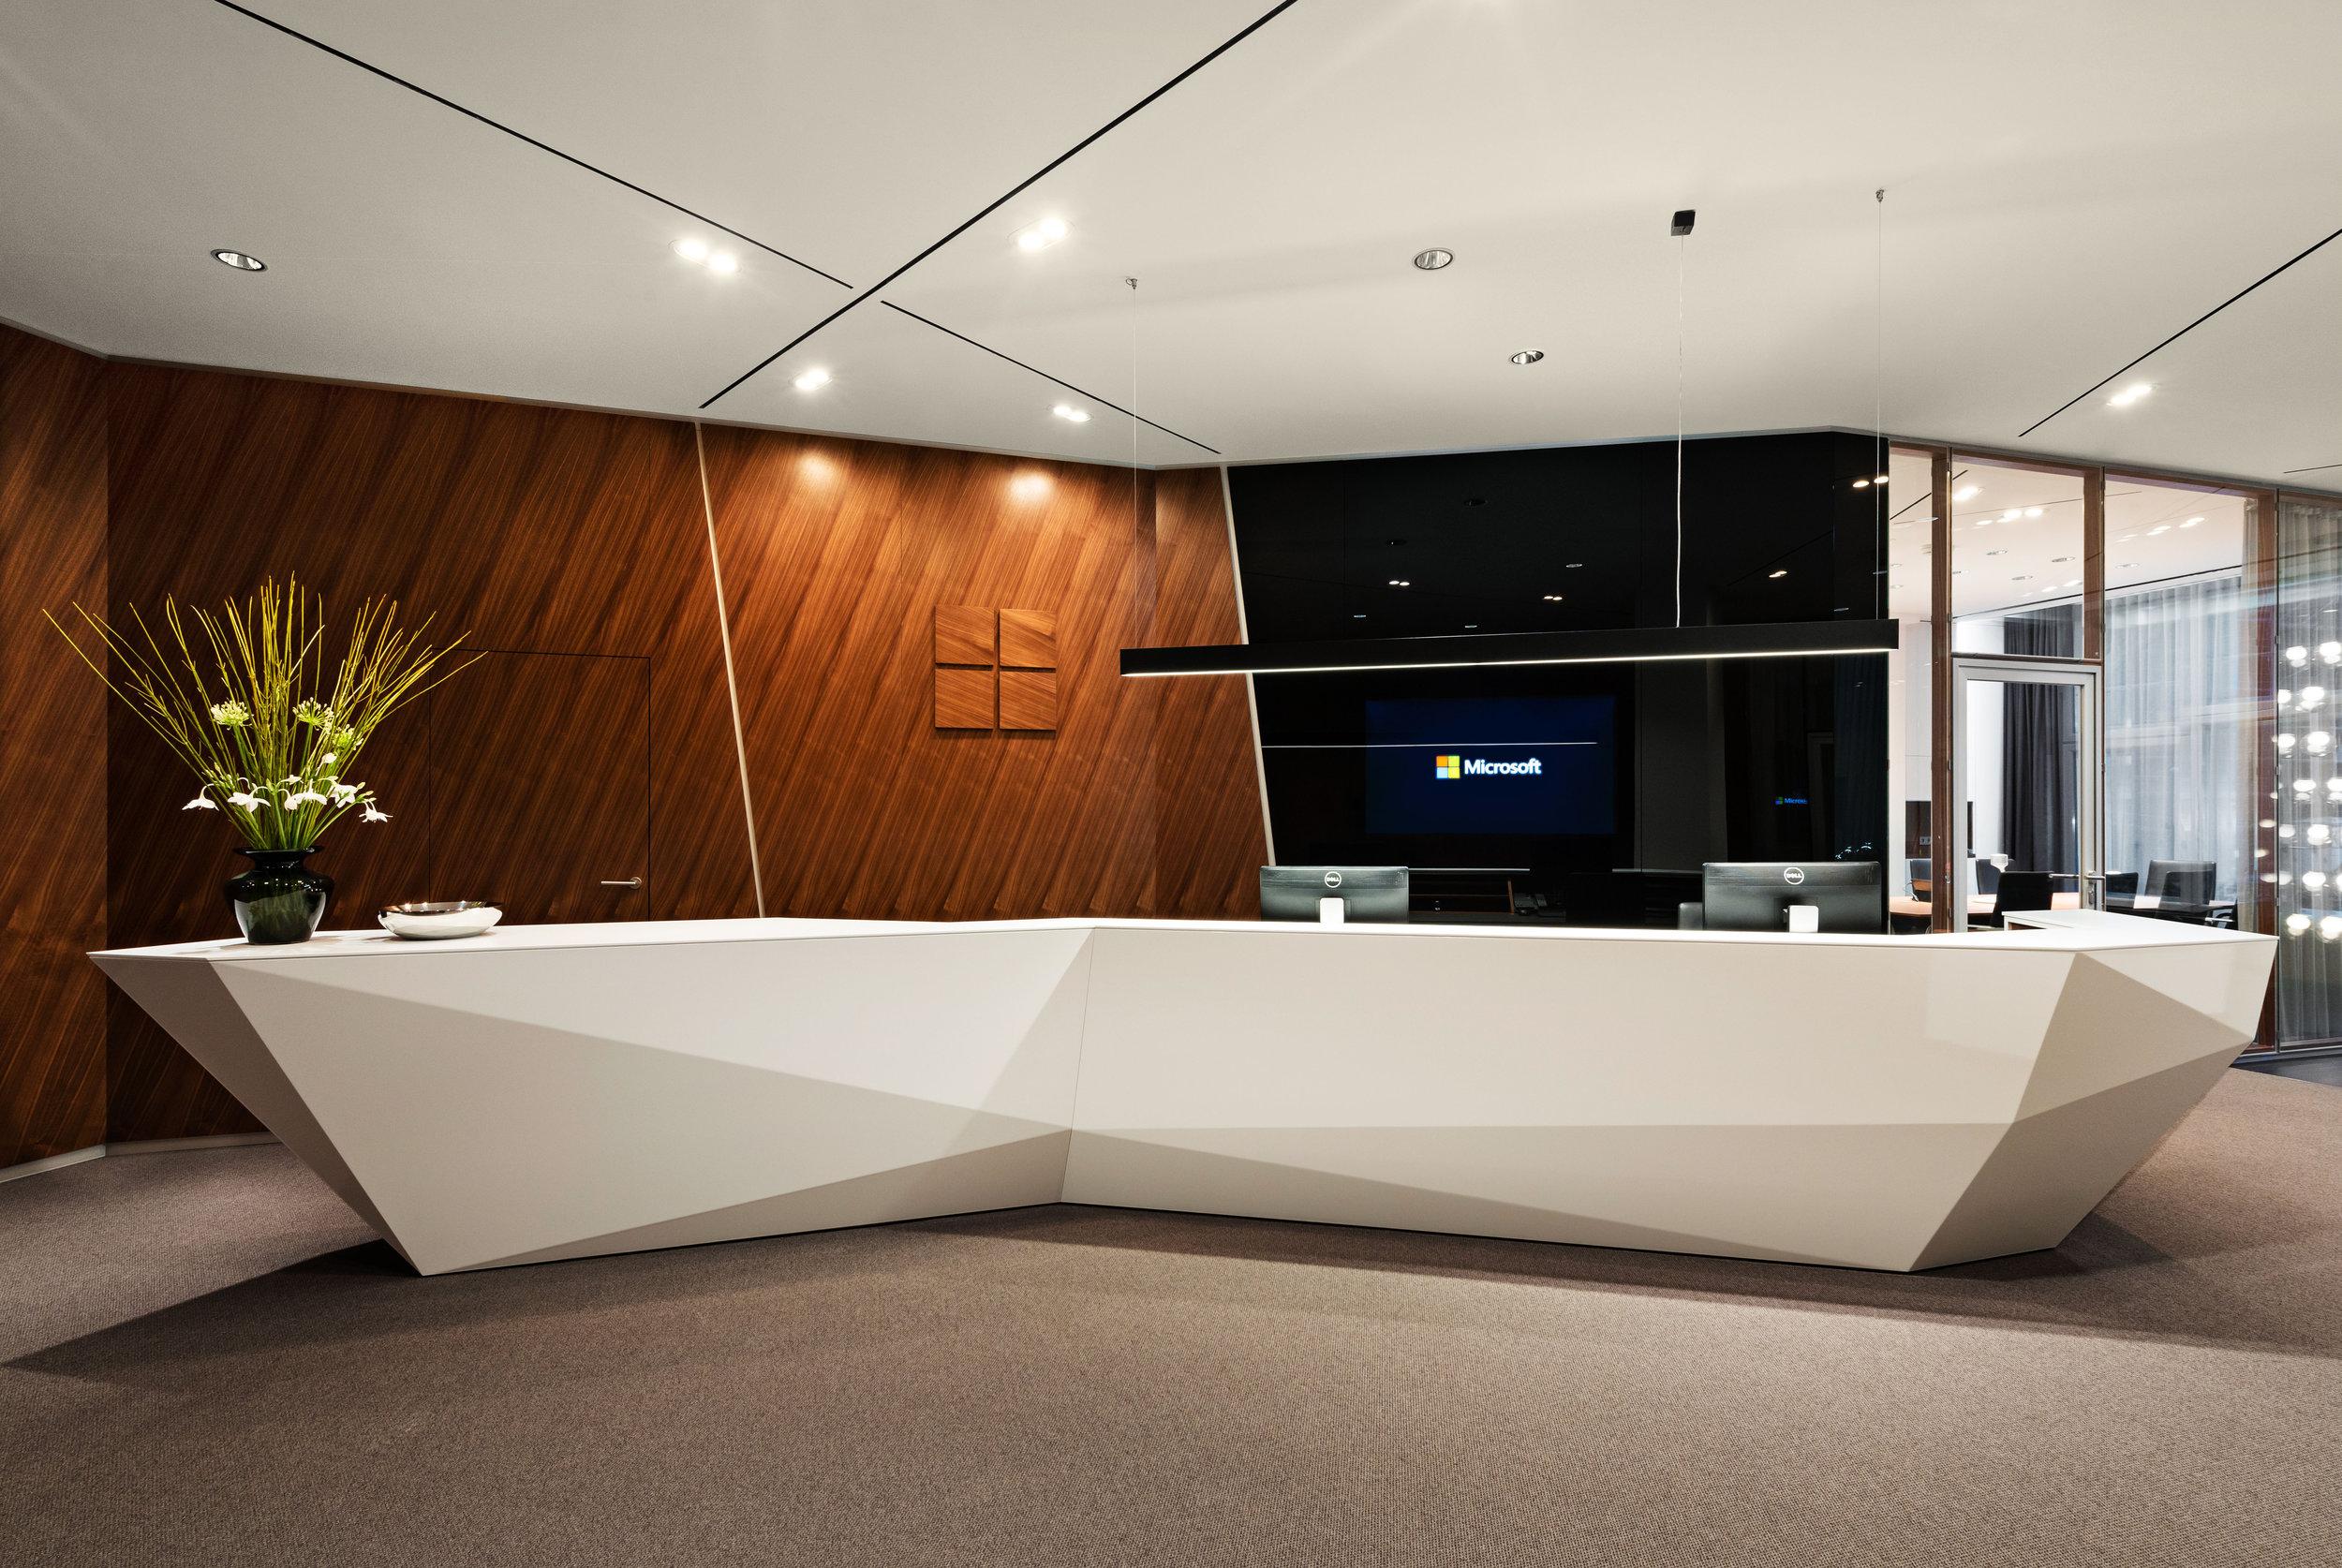 microsoft-center_coorporate-interior-design_coordination-berlin_08.jpg